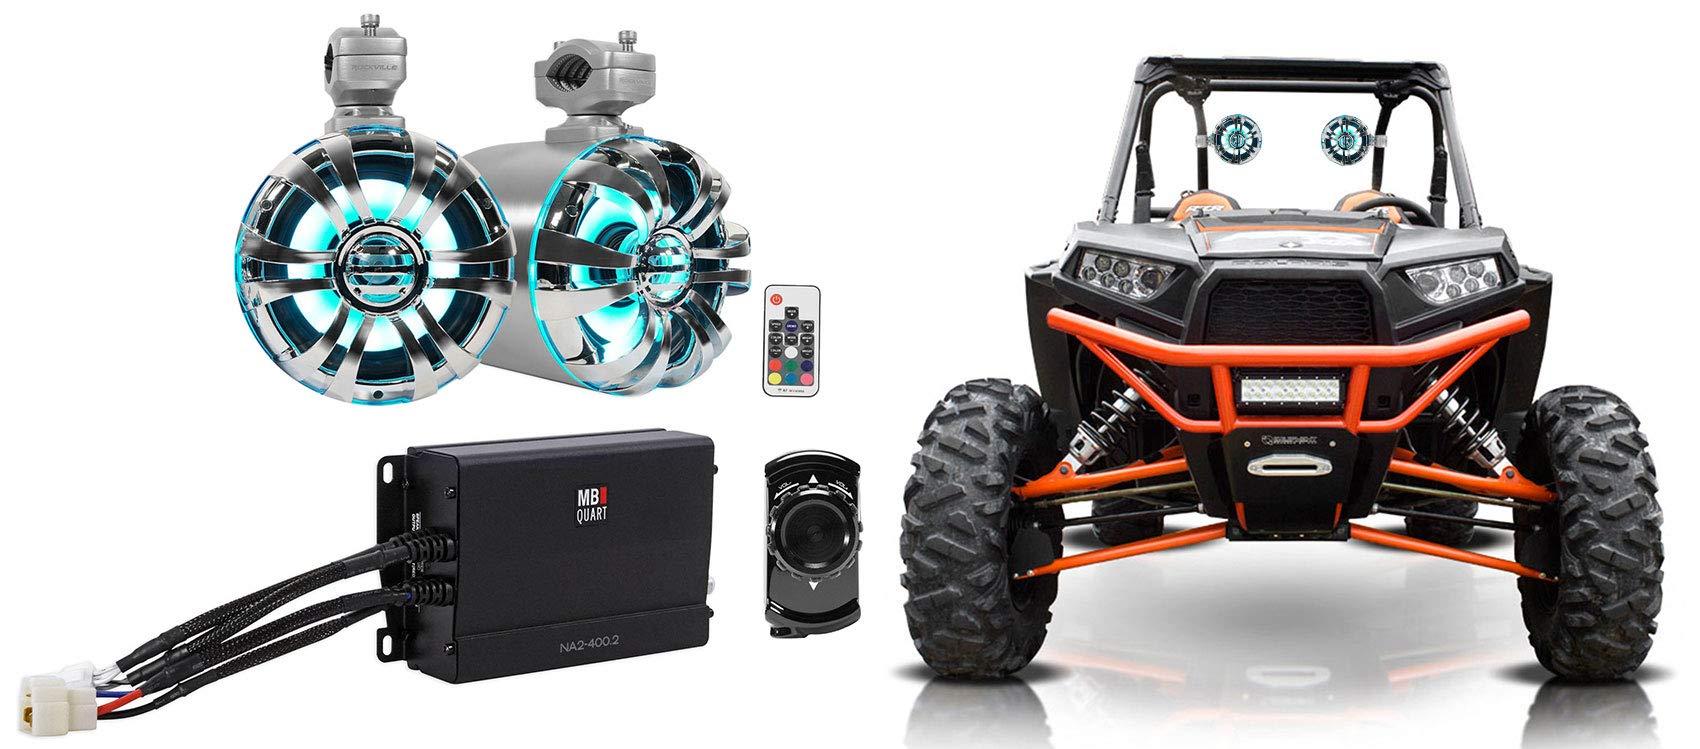 2 Rockville 6.5'' LED Tower Speakers+MB QUART Amp+Bluetooth Ctrl RZR/ATV/UTV/Cart